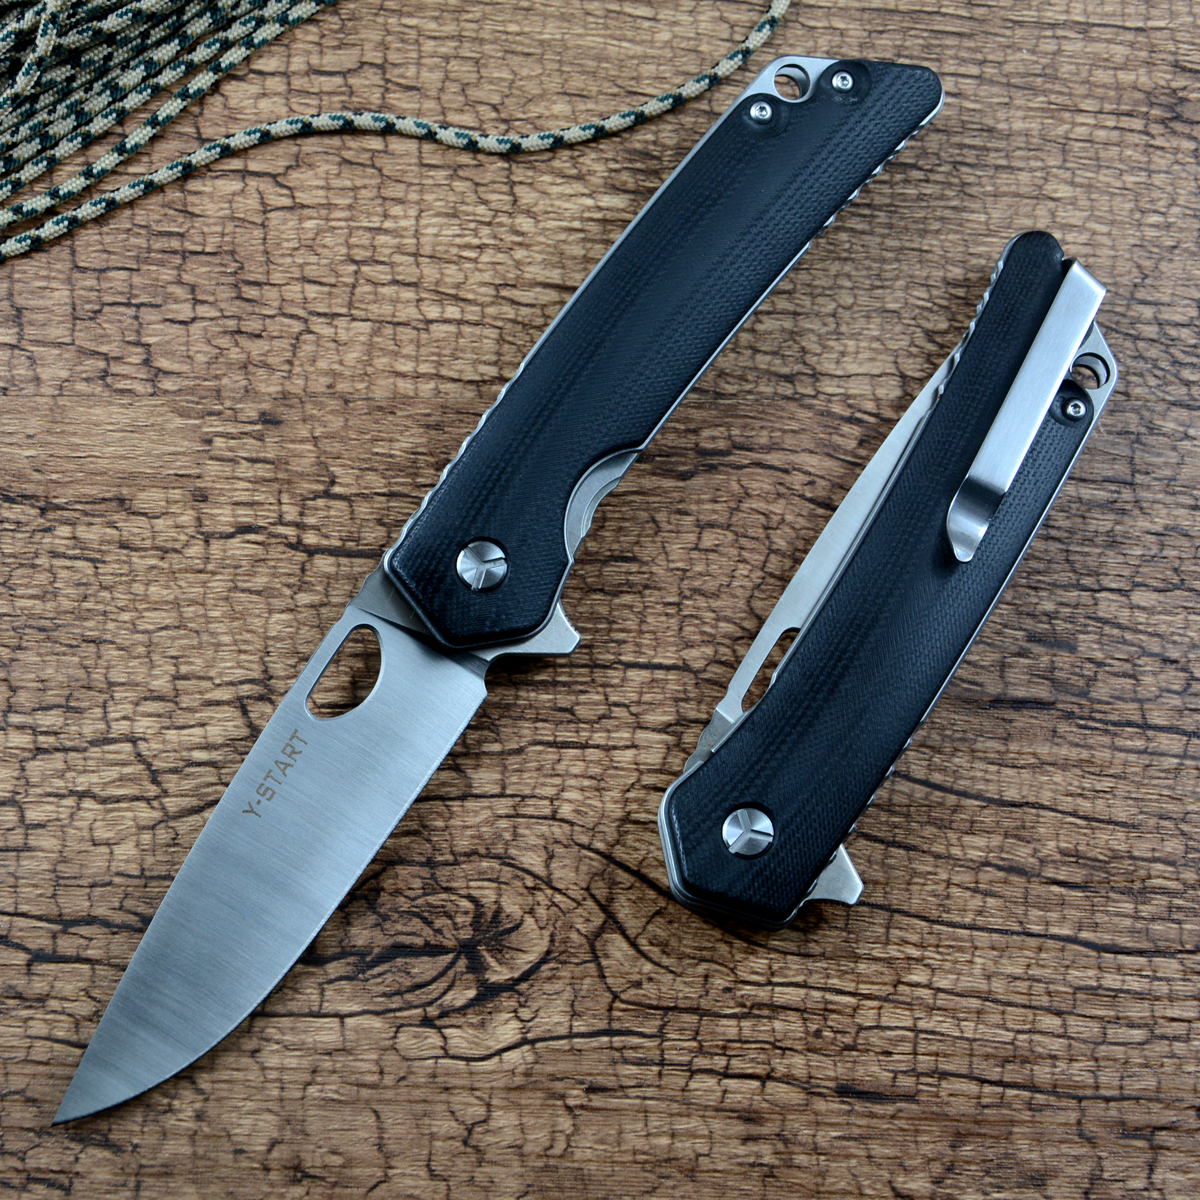 Y-START LK5016 Flipper Folding Knife Fast Open 440C Satin Blade G10 Handle Fruit Outdoor EDC Tools